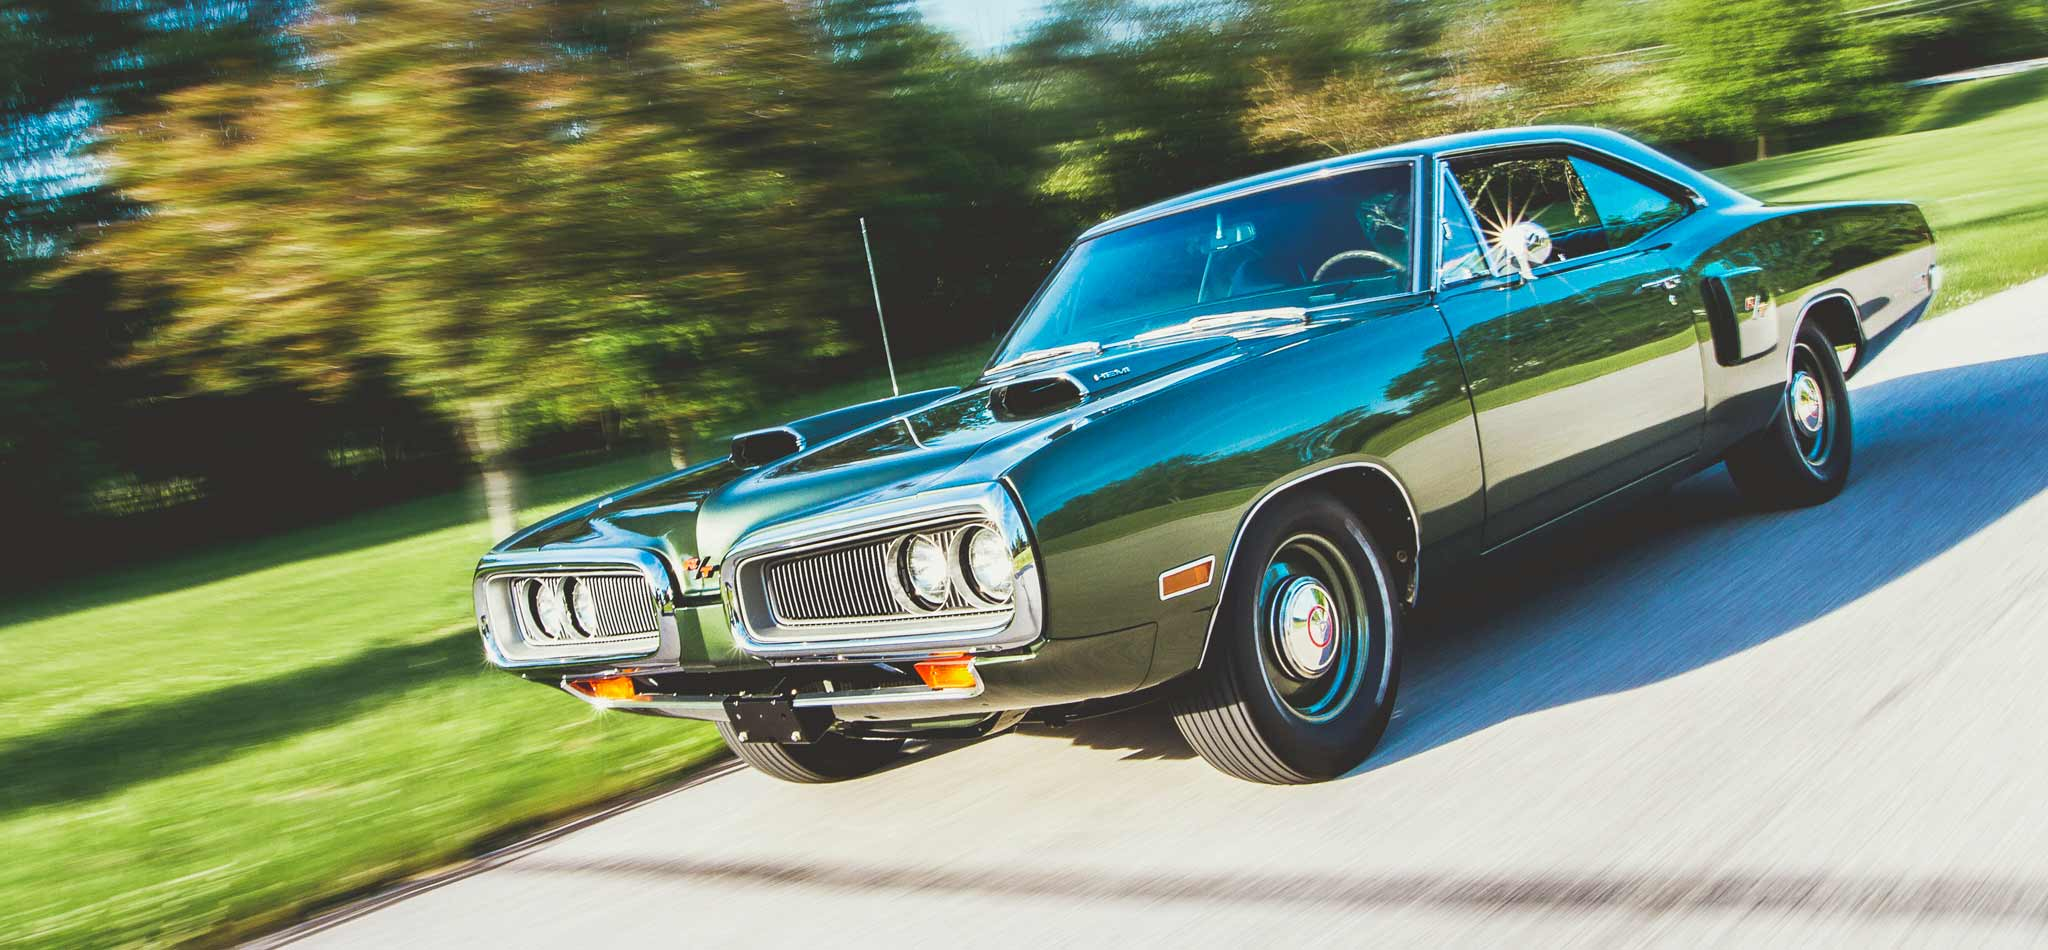 1970 Dodge Hemi Coronet R T Teddy Pieper Photography Design